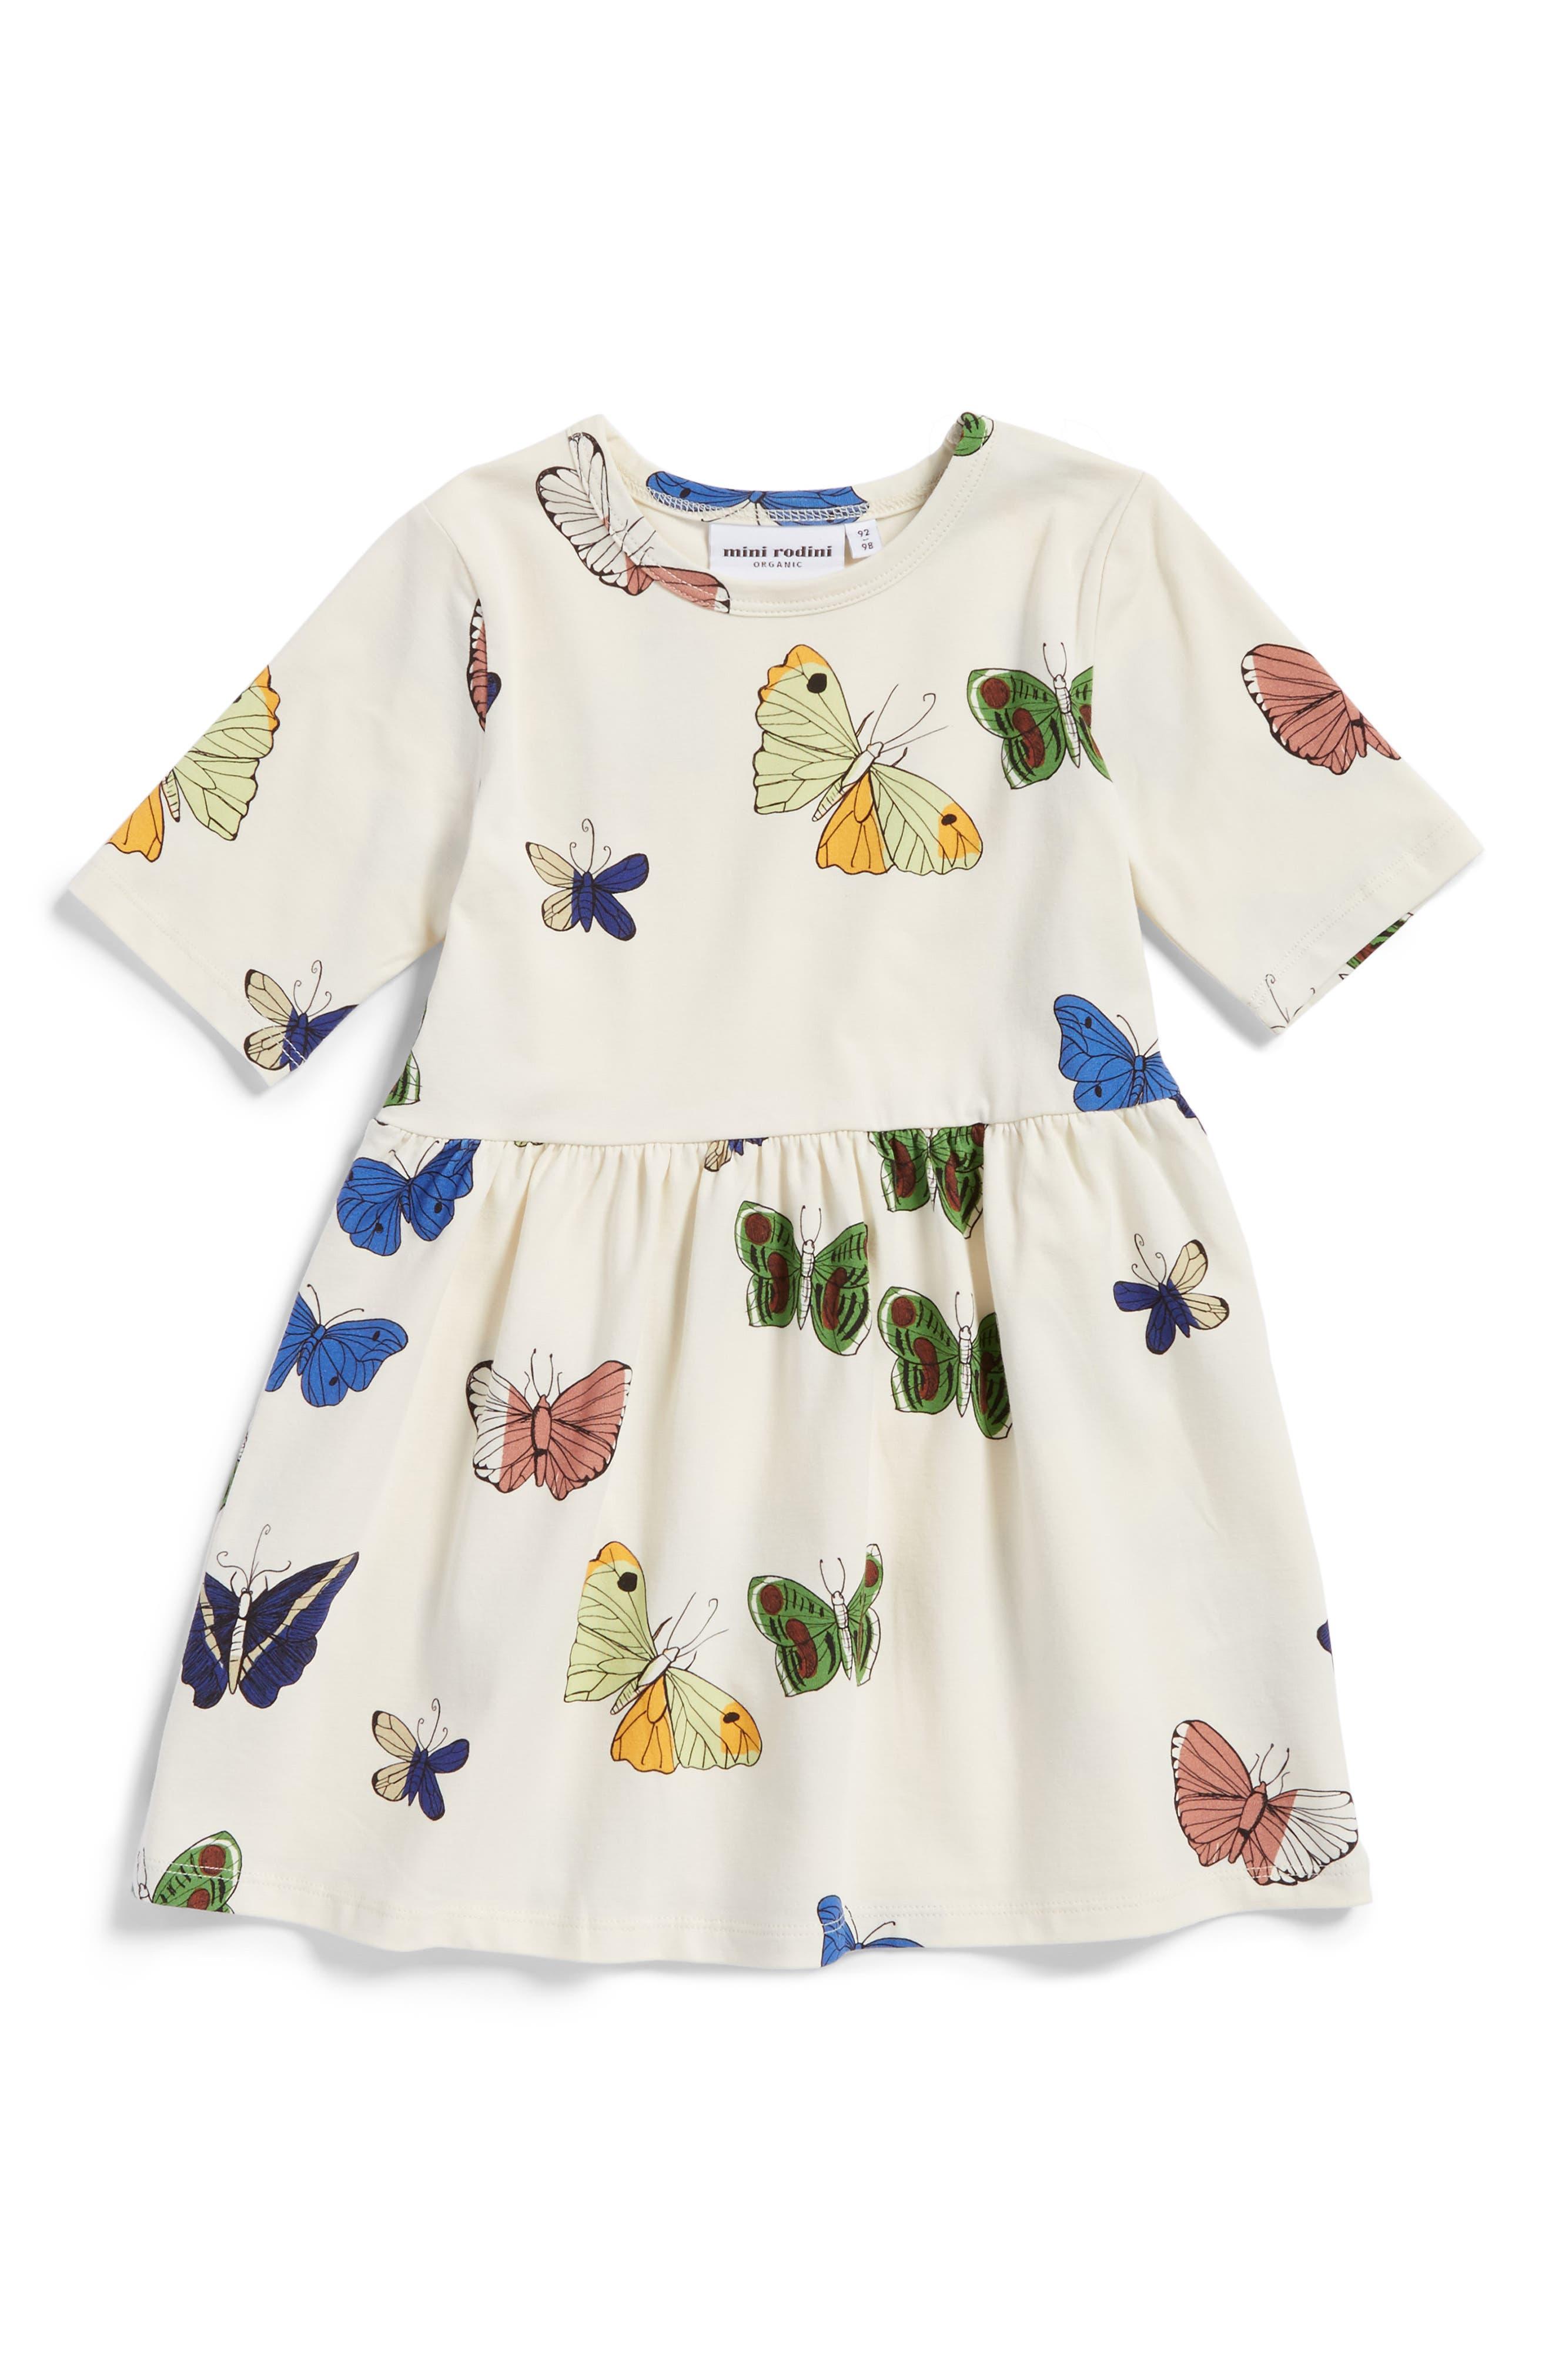 Main Image - Mini Rodini Butterflies Organic Cotton Dress (Toddler Girls & Little Girls)